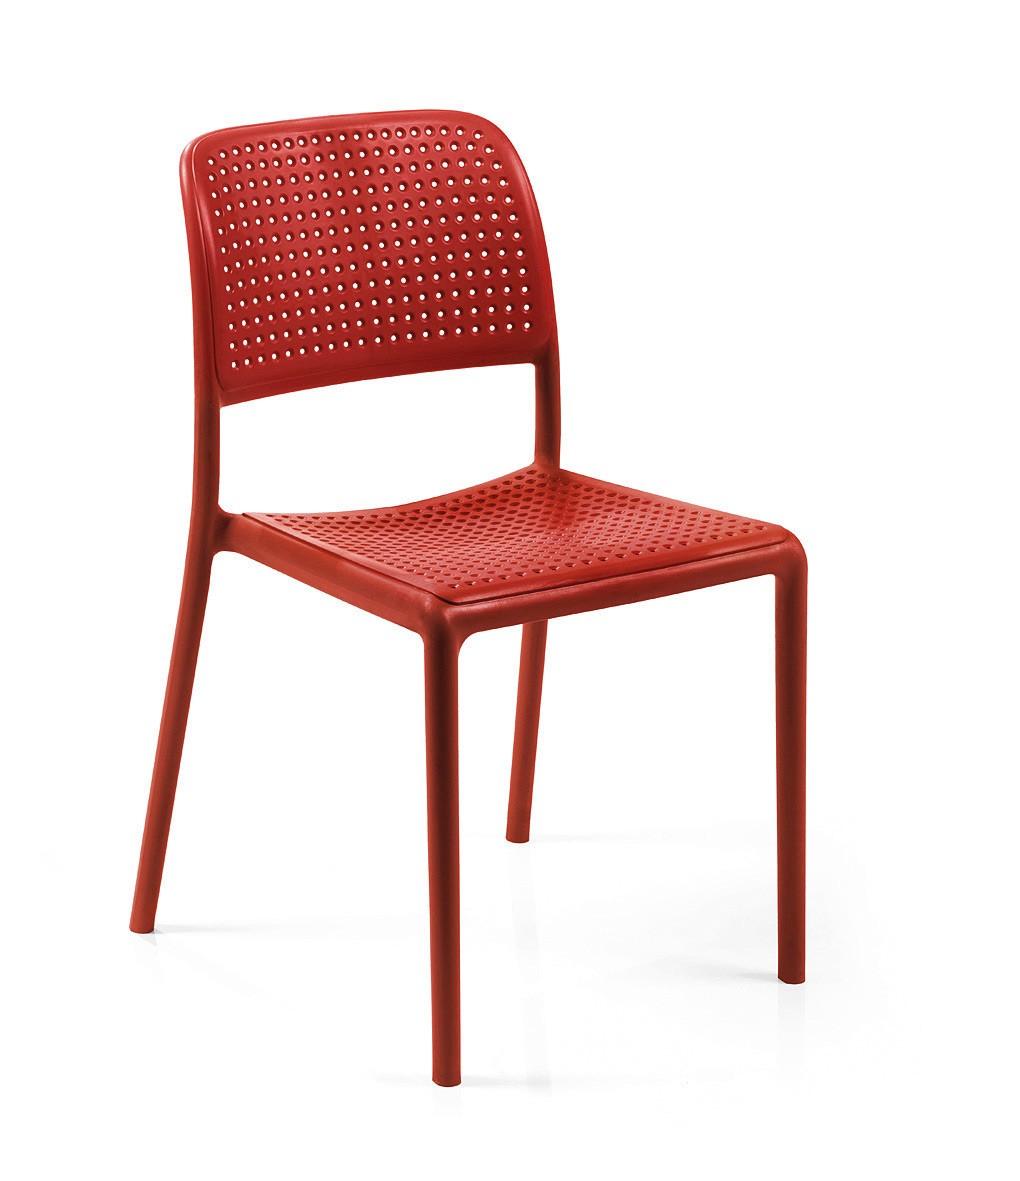 Nardi Stapelstuhl / Gartenstuhl Bora Bistrot Kunststoff rosso Bild 1